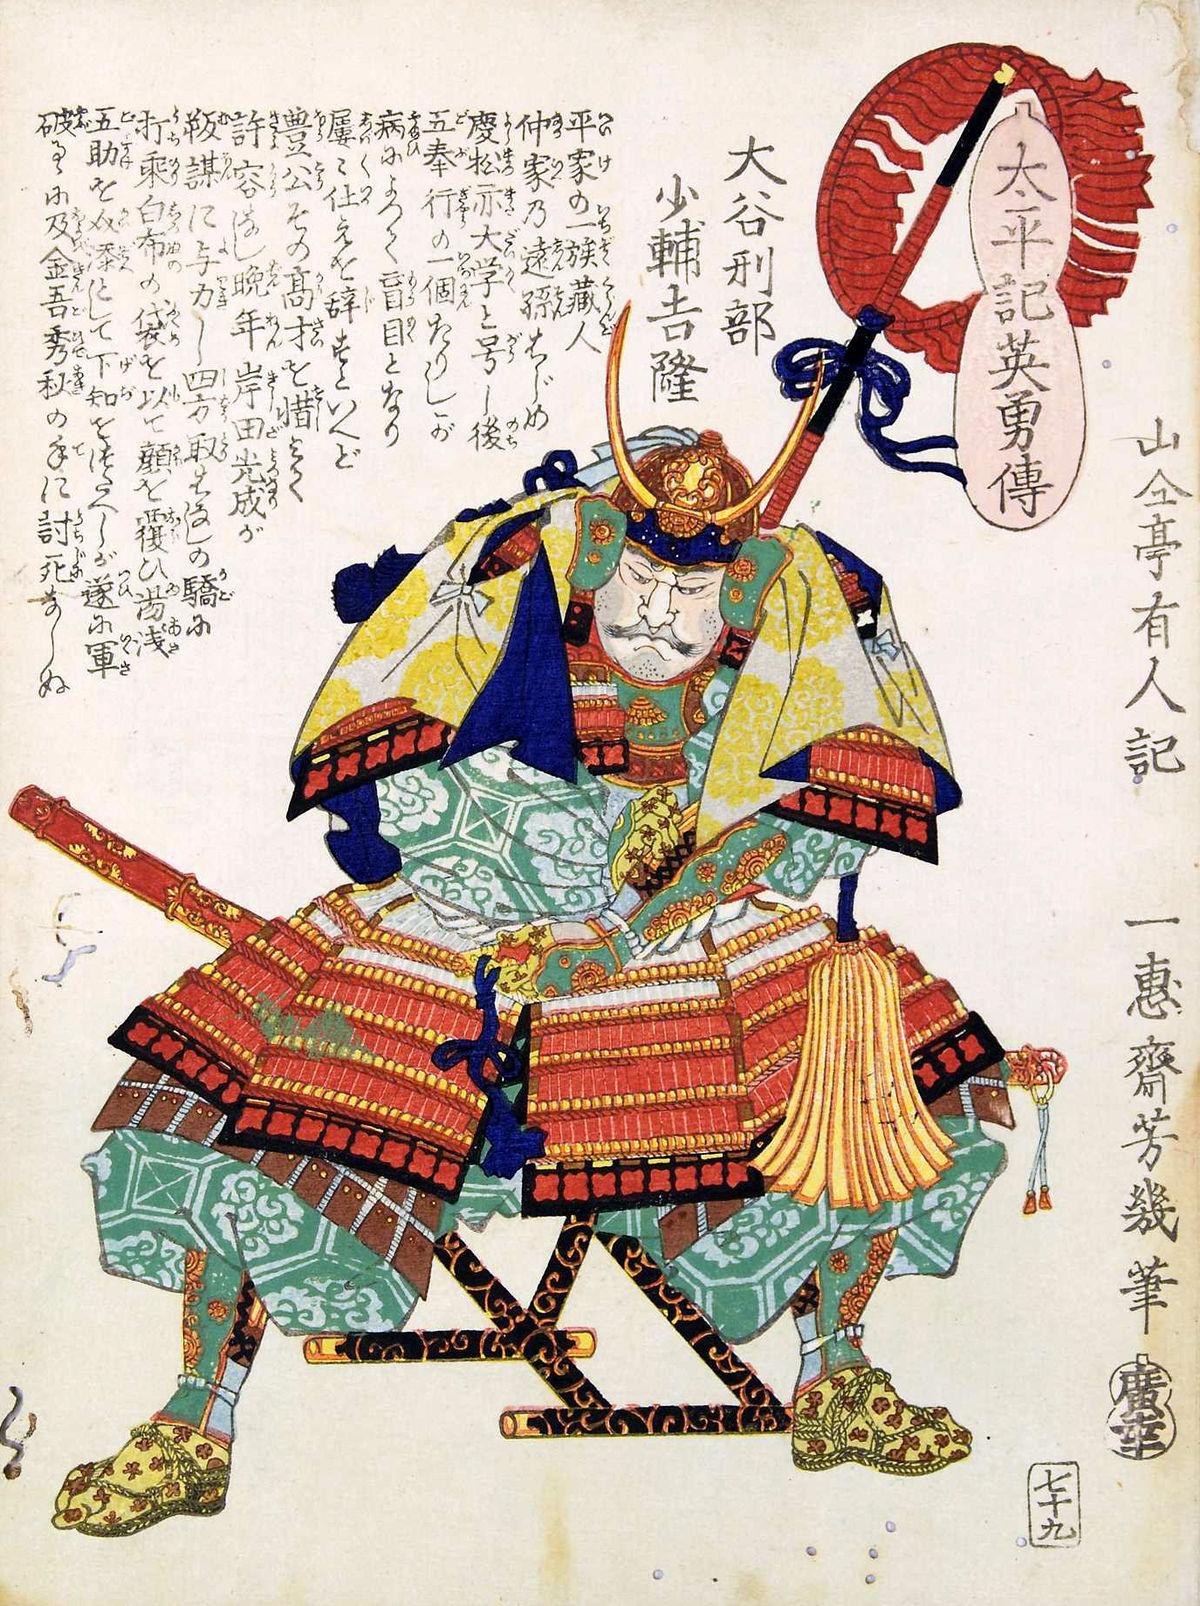 Ōtani Yoshitsugu - Wikipedia